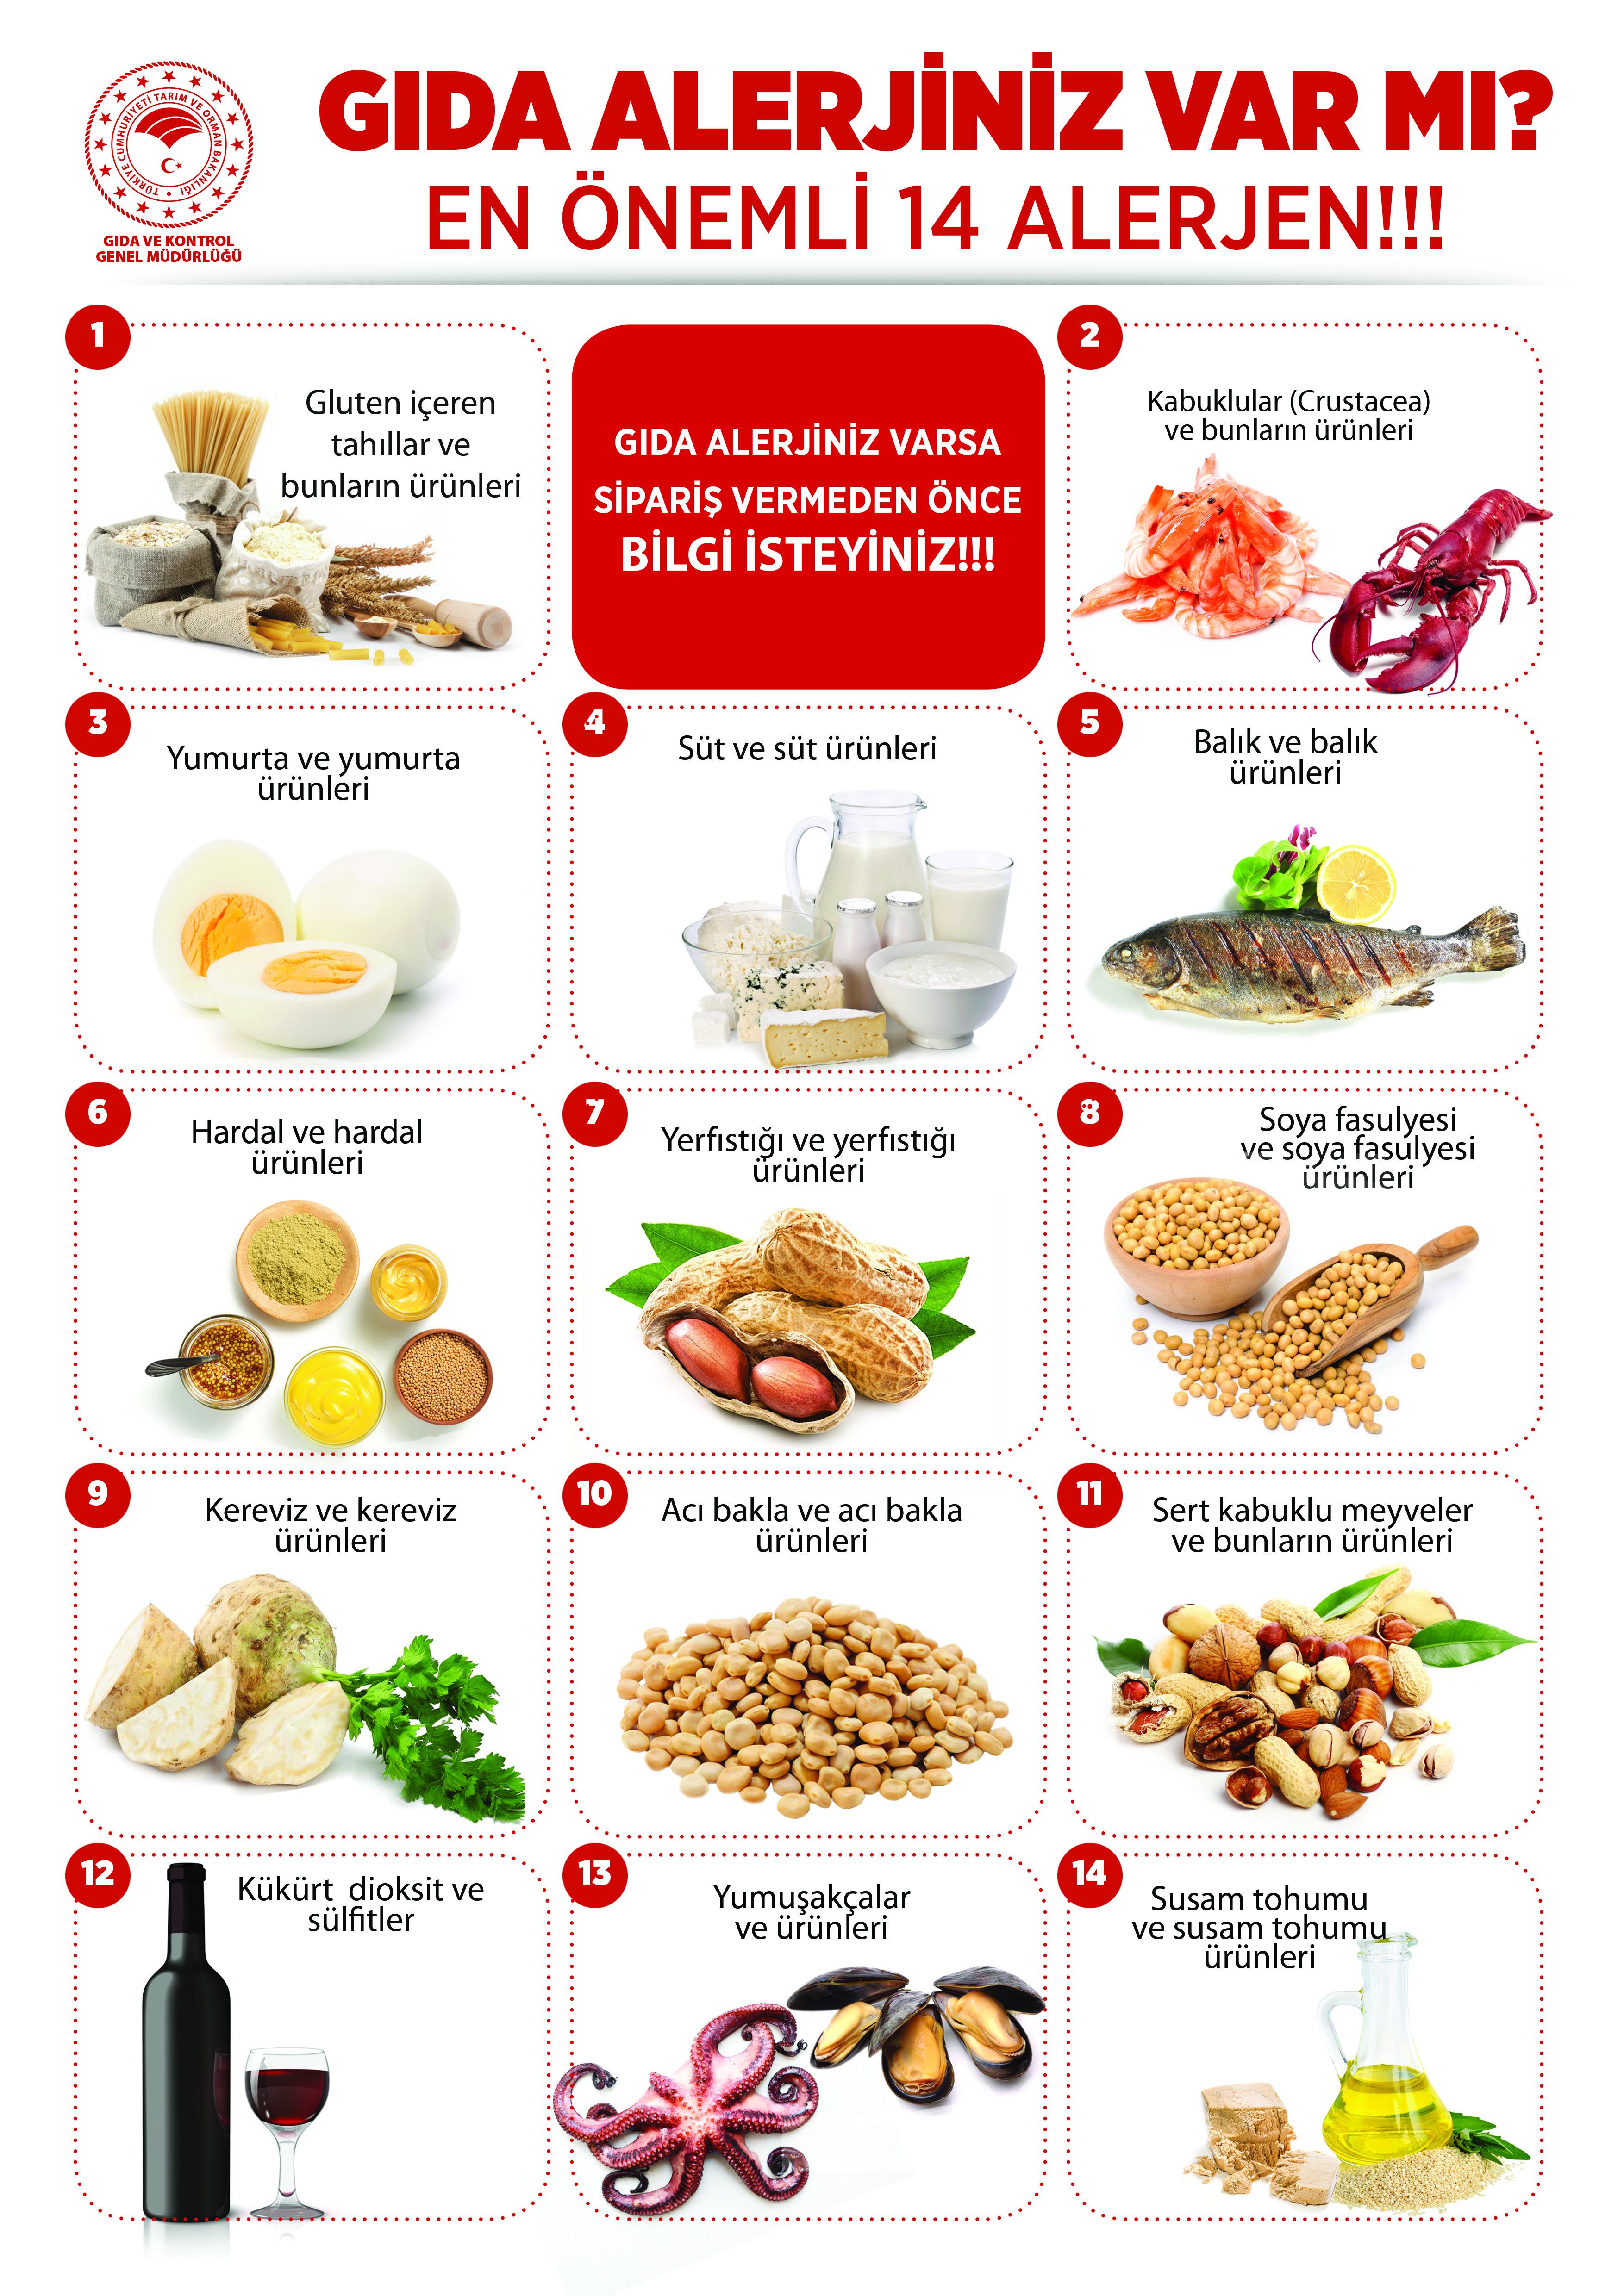 Gıda Alerjenleri.jpg